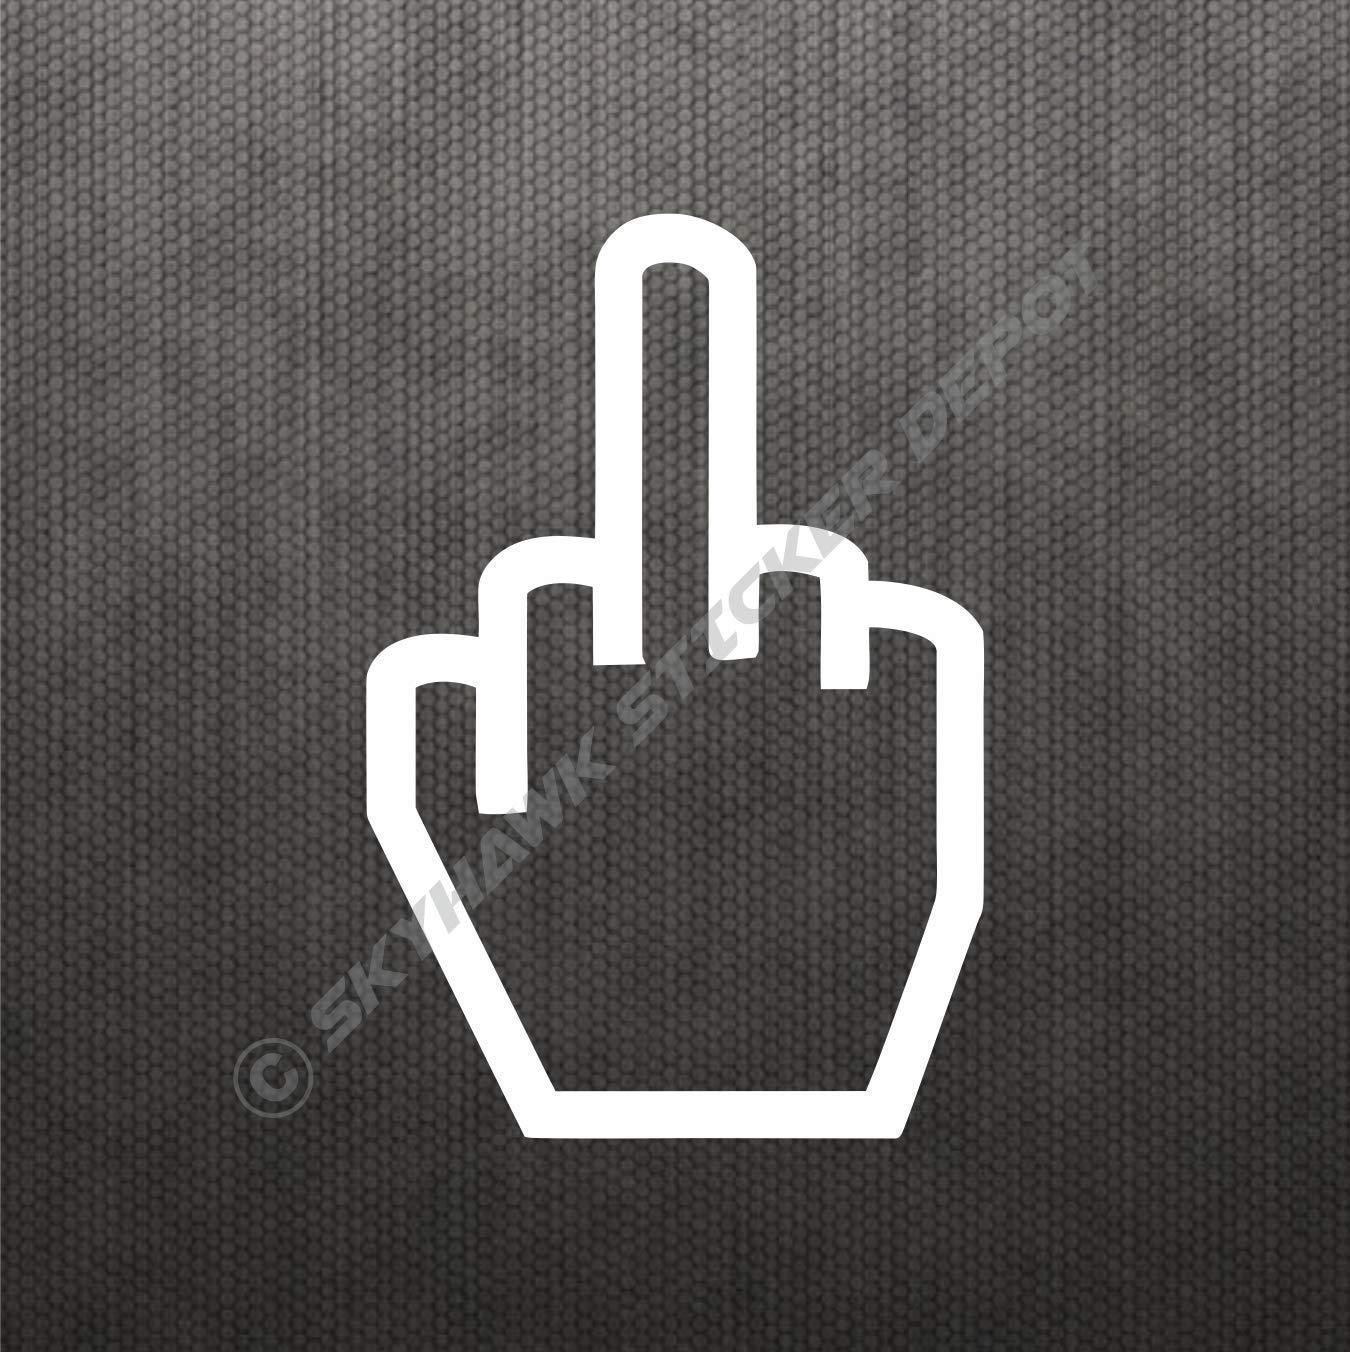 Middle Finger Funny Hand Gesture Jdm Car Body Window Bumper Vinyl Decal Sticker